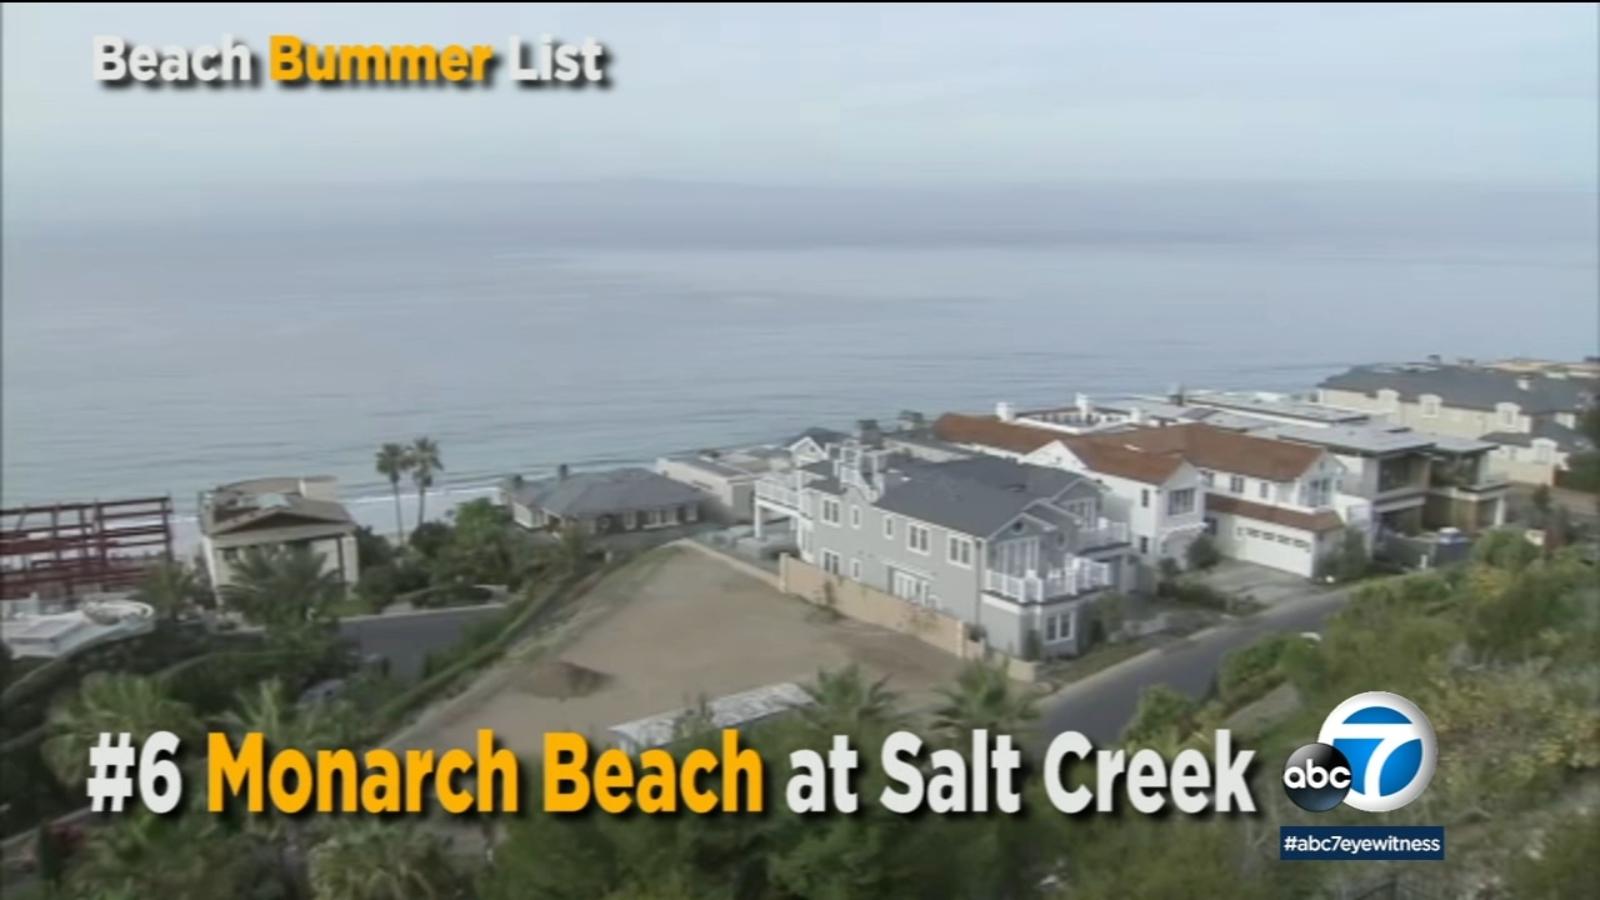 Five Southern California Beaches placed on Beach Bummer list